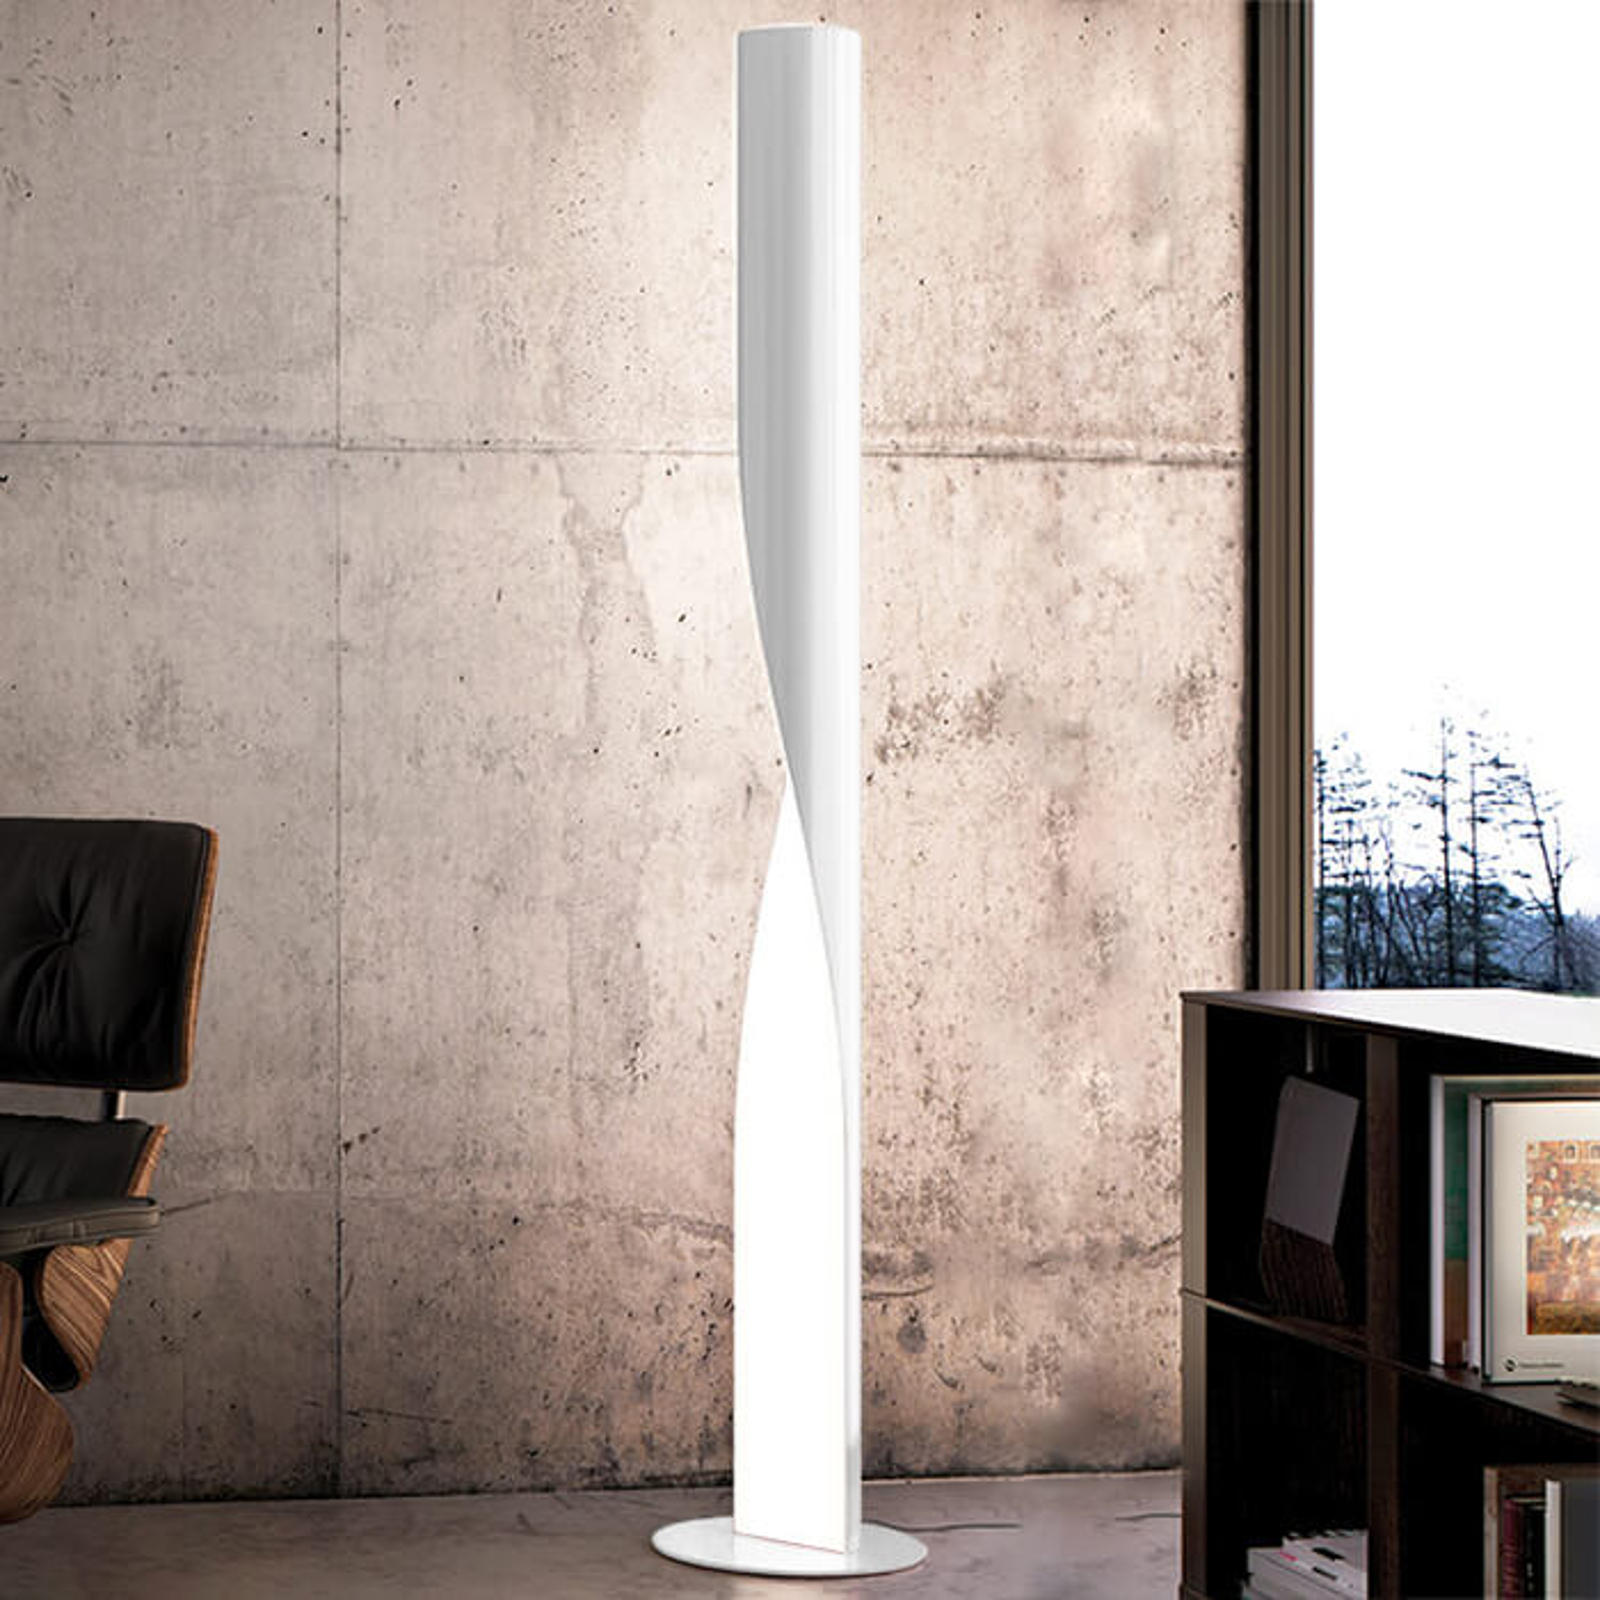 Kundalini Evita - LED vloerlamp, wit